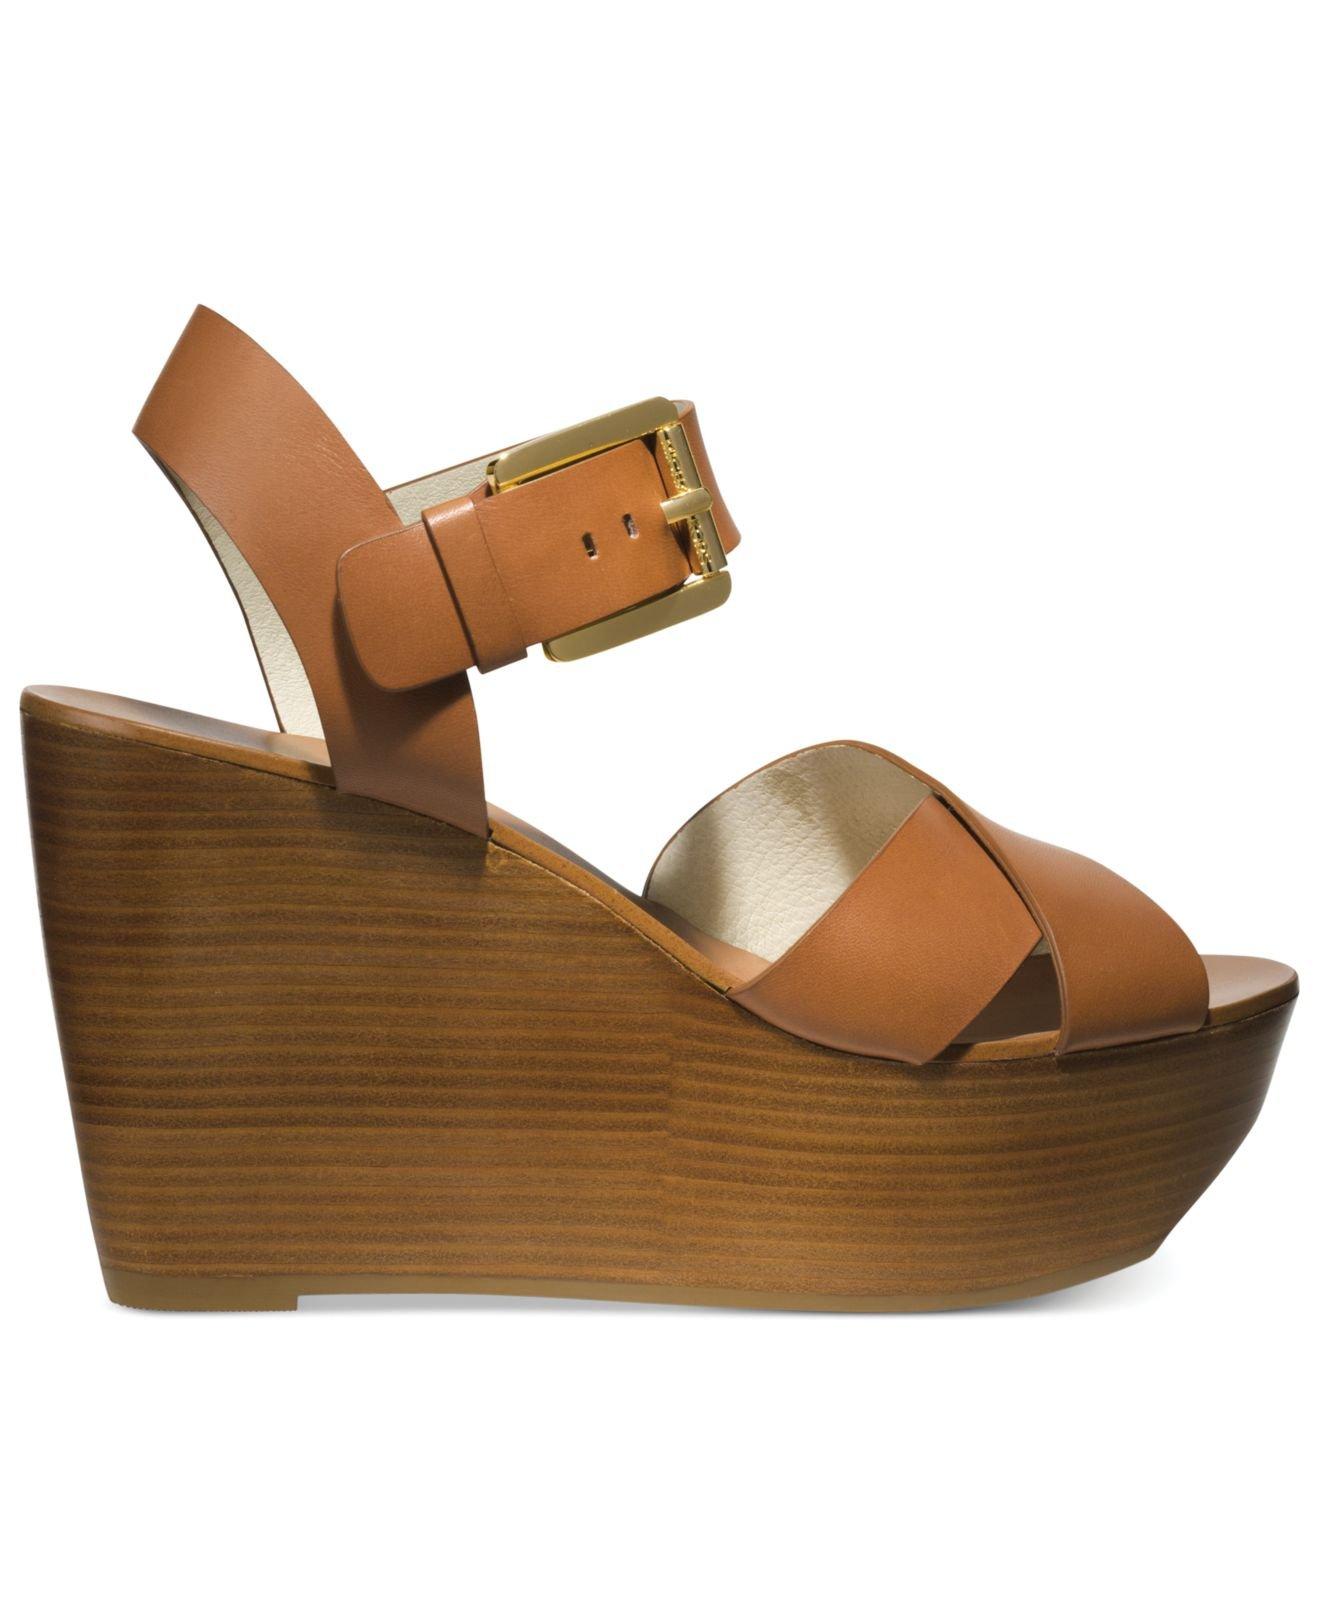 6d91b0f9dfc9 Lyst - Michael Kors Michael Peggy Platform Wedge Sandals in Brown